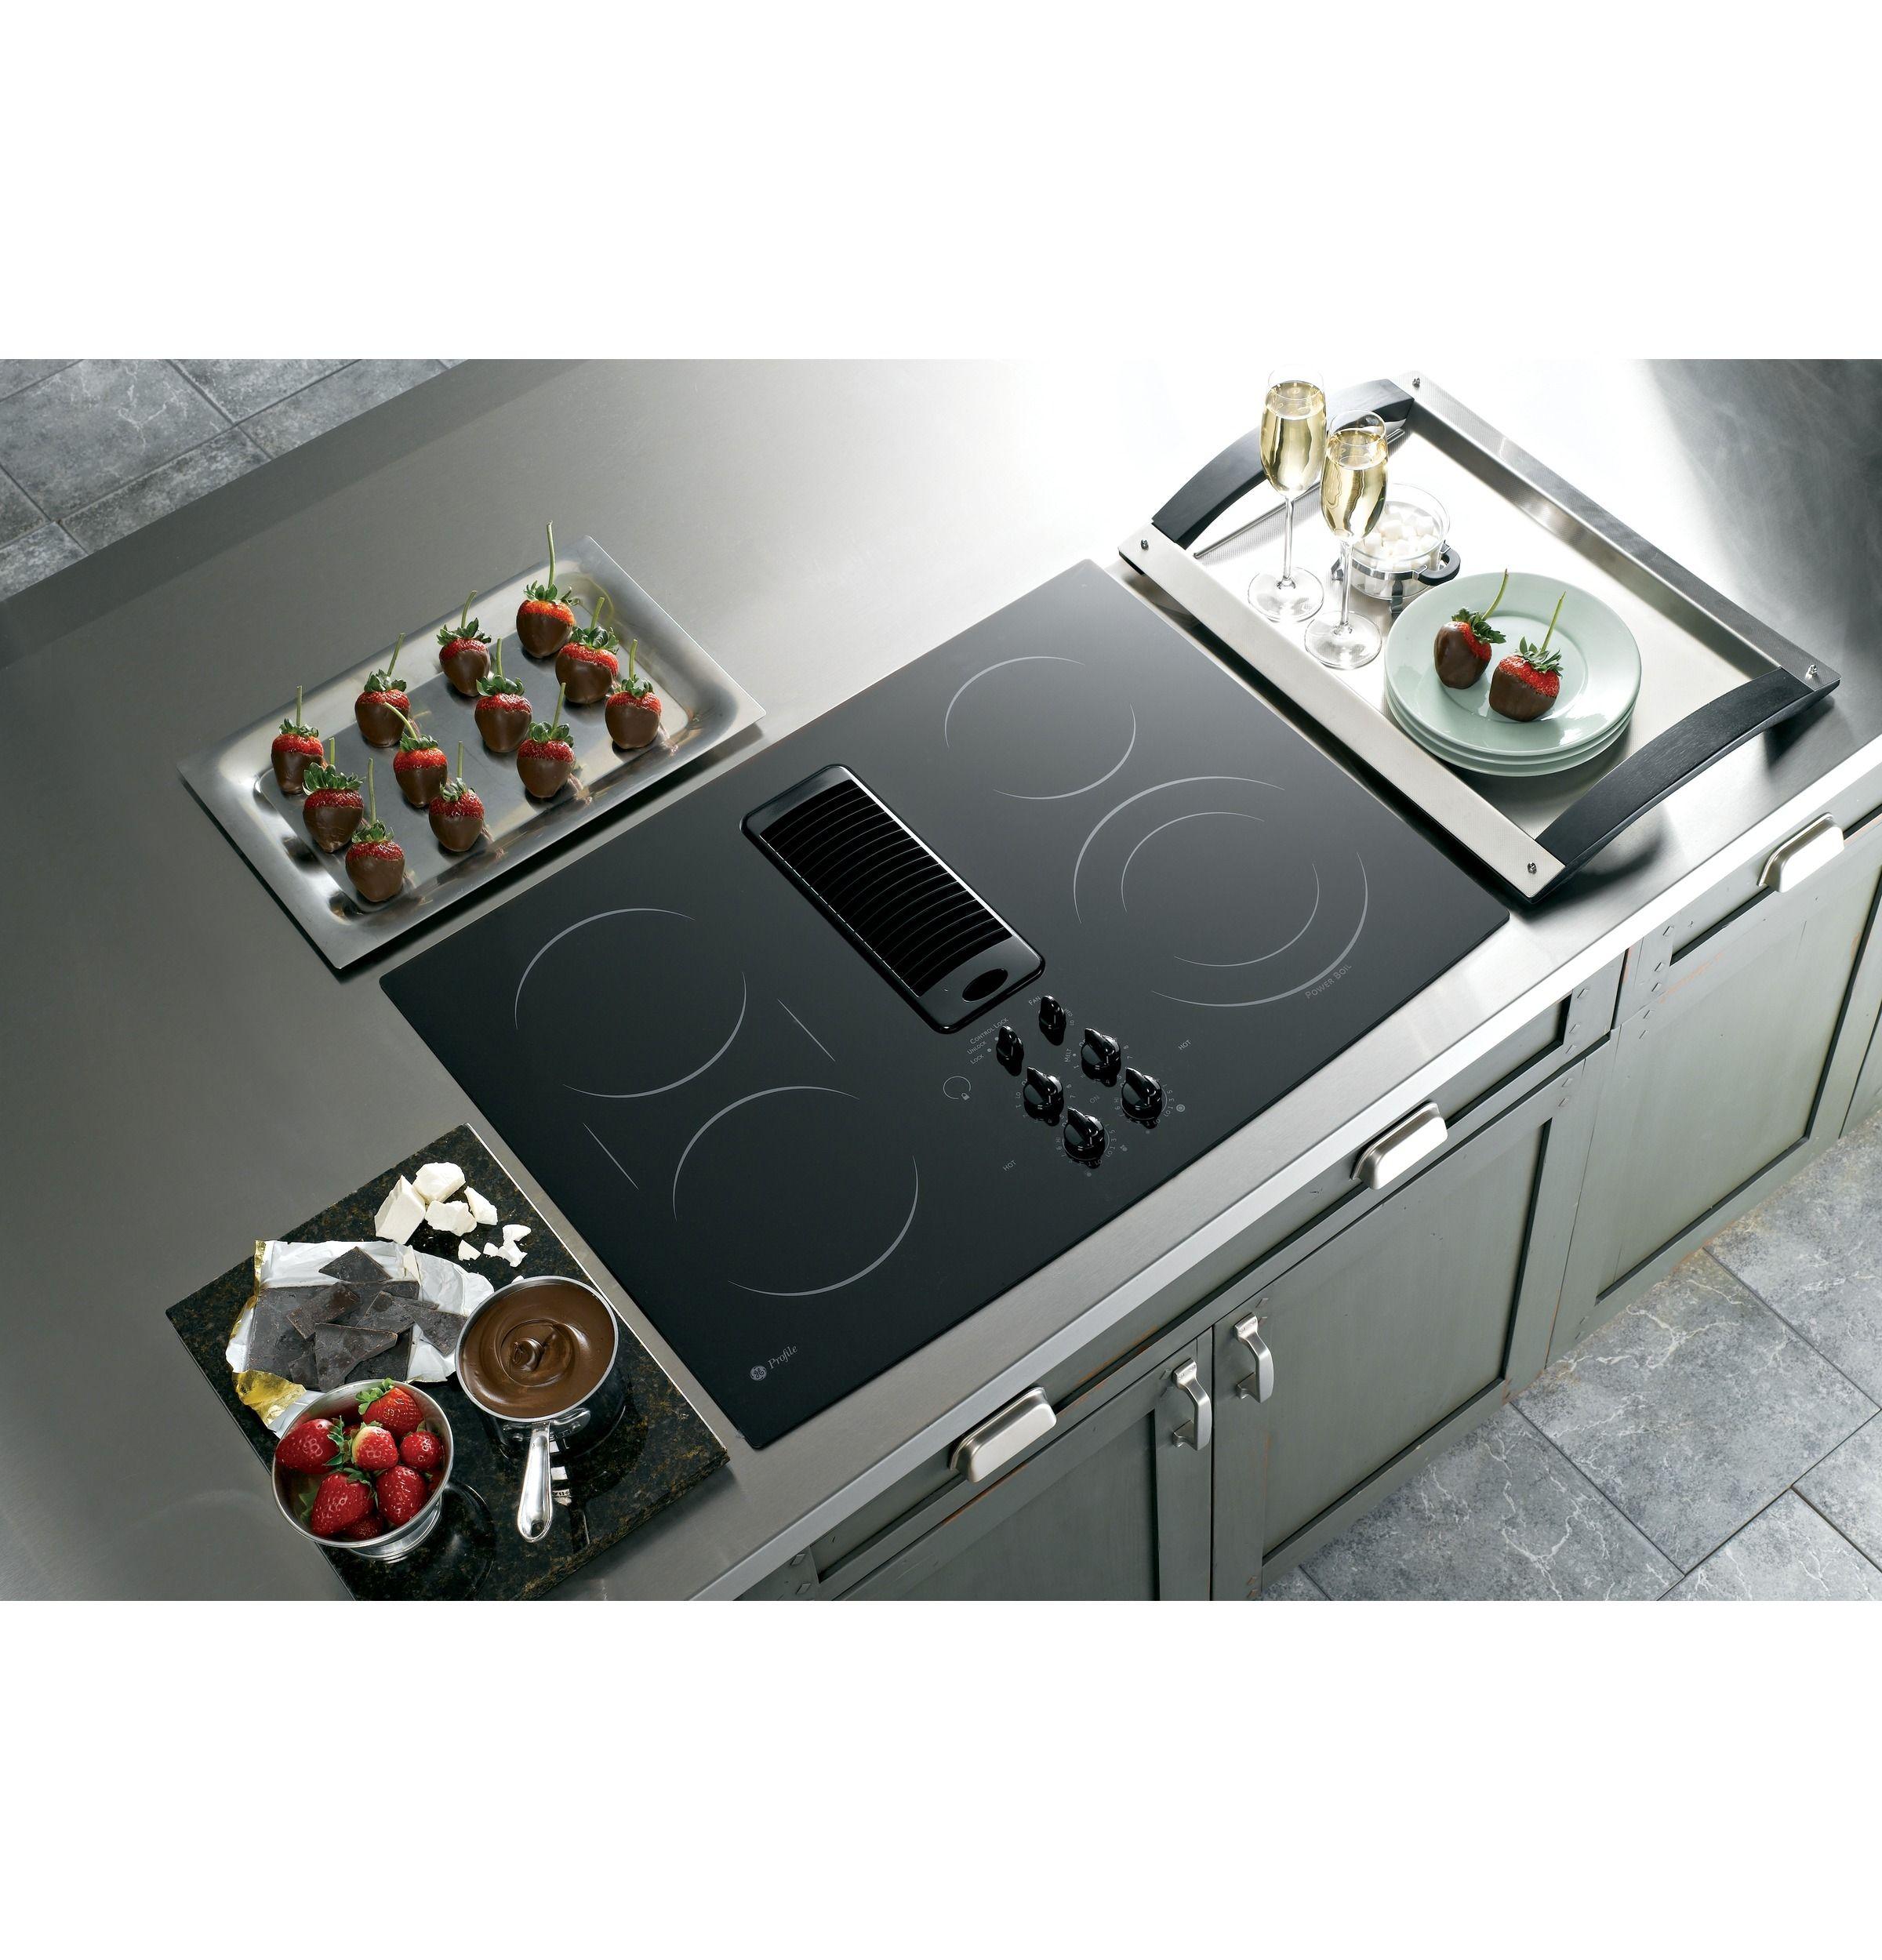 Pp989dnbb Ge Profile Series 30 Downdraft Electric Cooktop Ge Appliances Electric Cooktop Downdraft Cooktop Cooktop